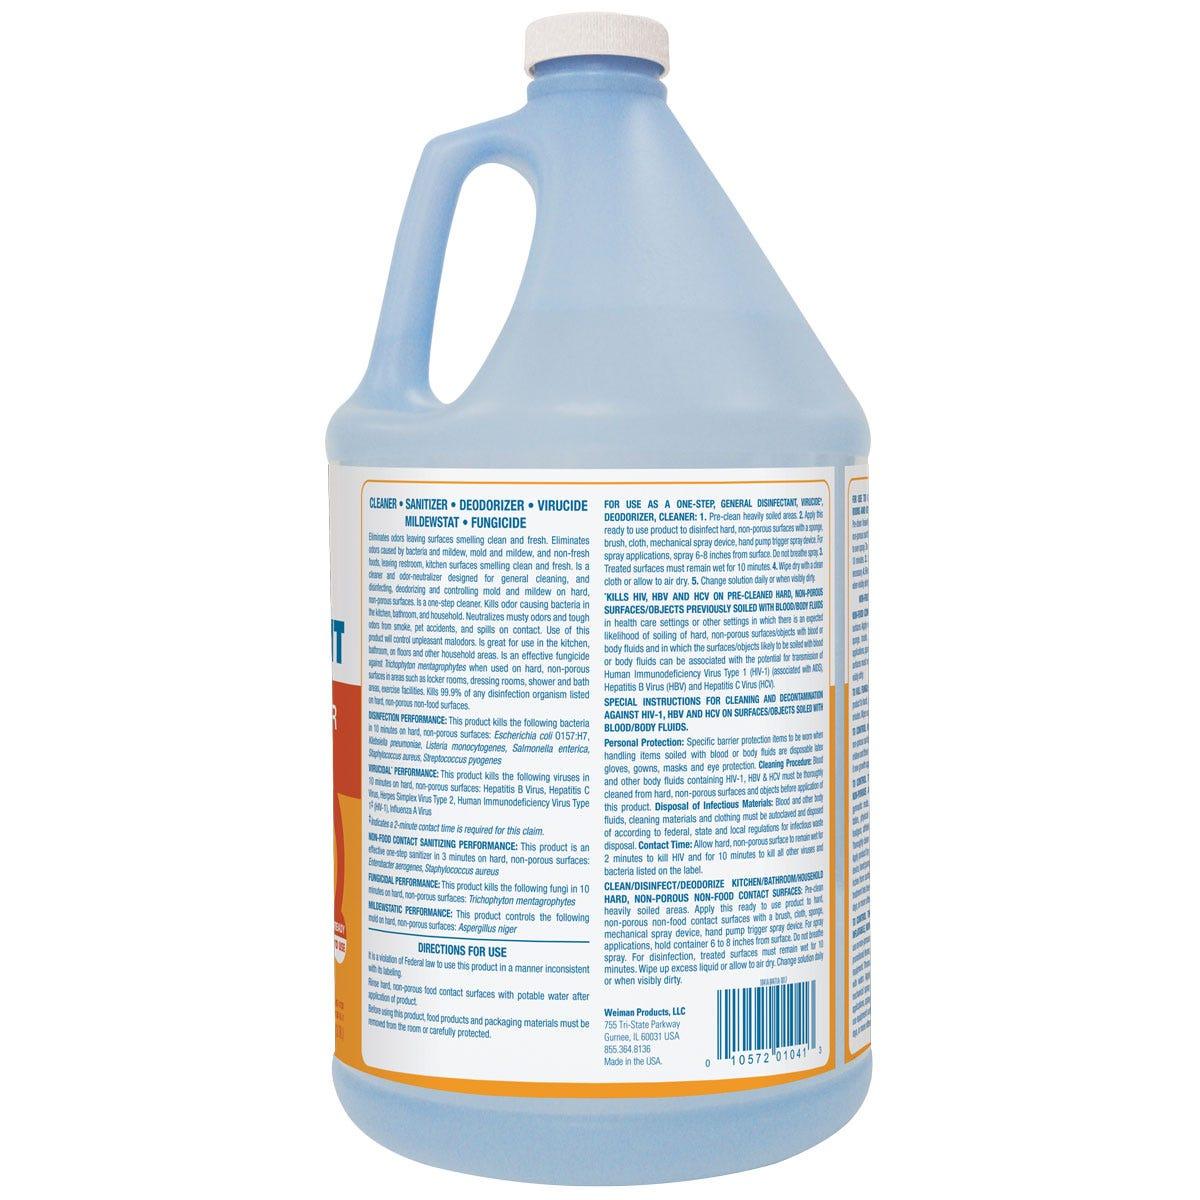 https://googone.com/media/catalog/product/c/i/citrus-disinfectant-odor-eliminator_back.jpg